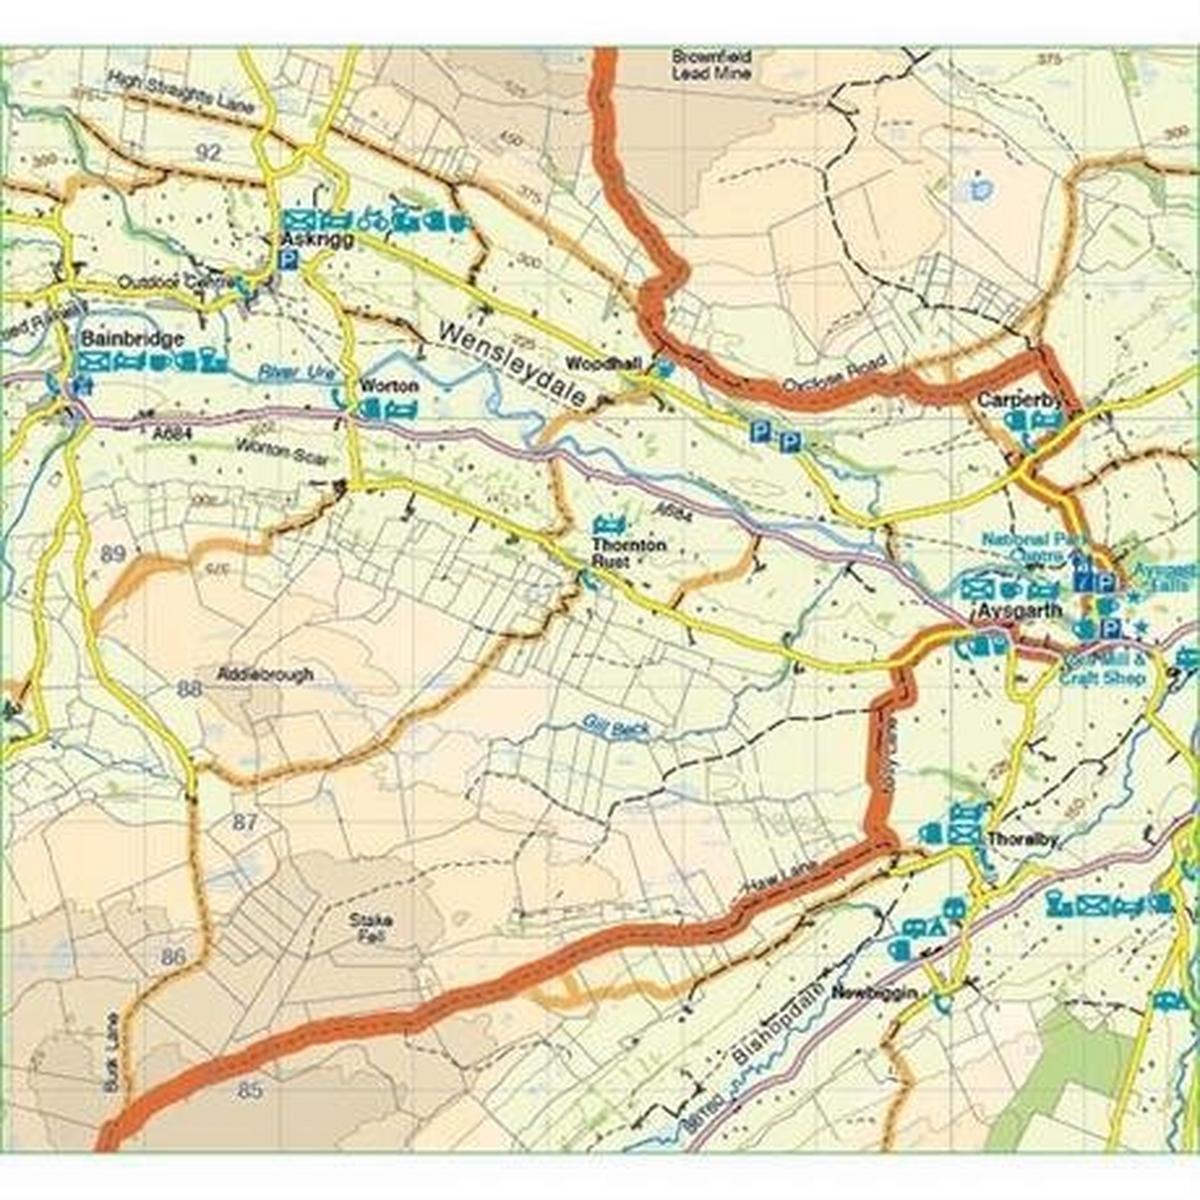 Harveys Harvey Map - XT60: Coast to Coast - East -  for Mountain Bikers and Cyclists